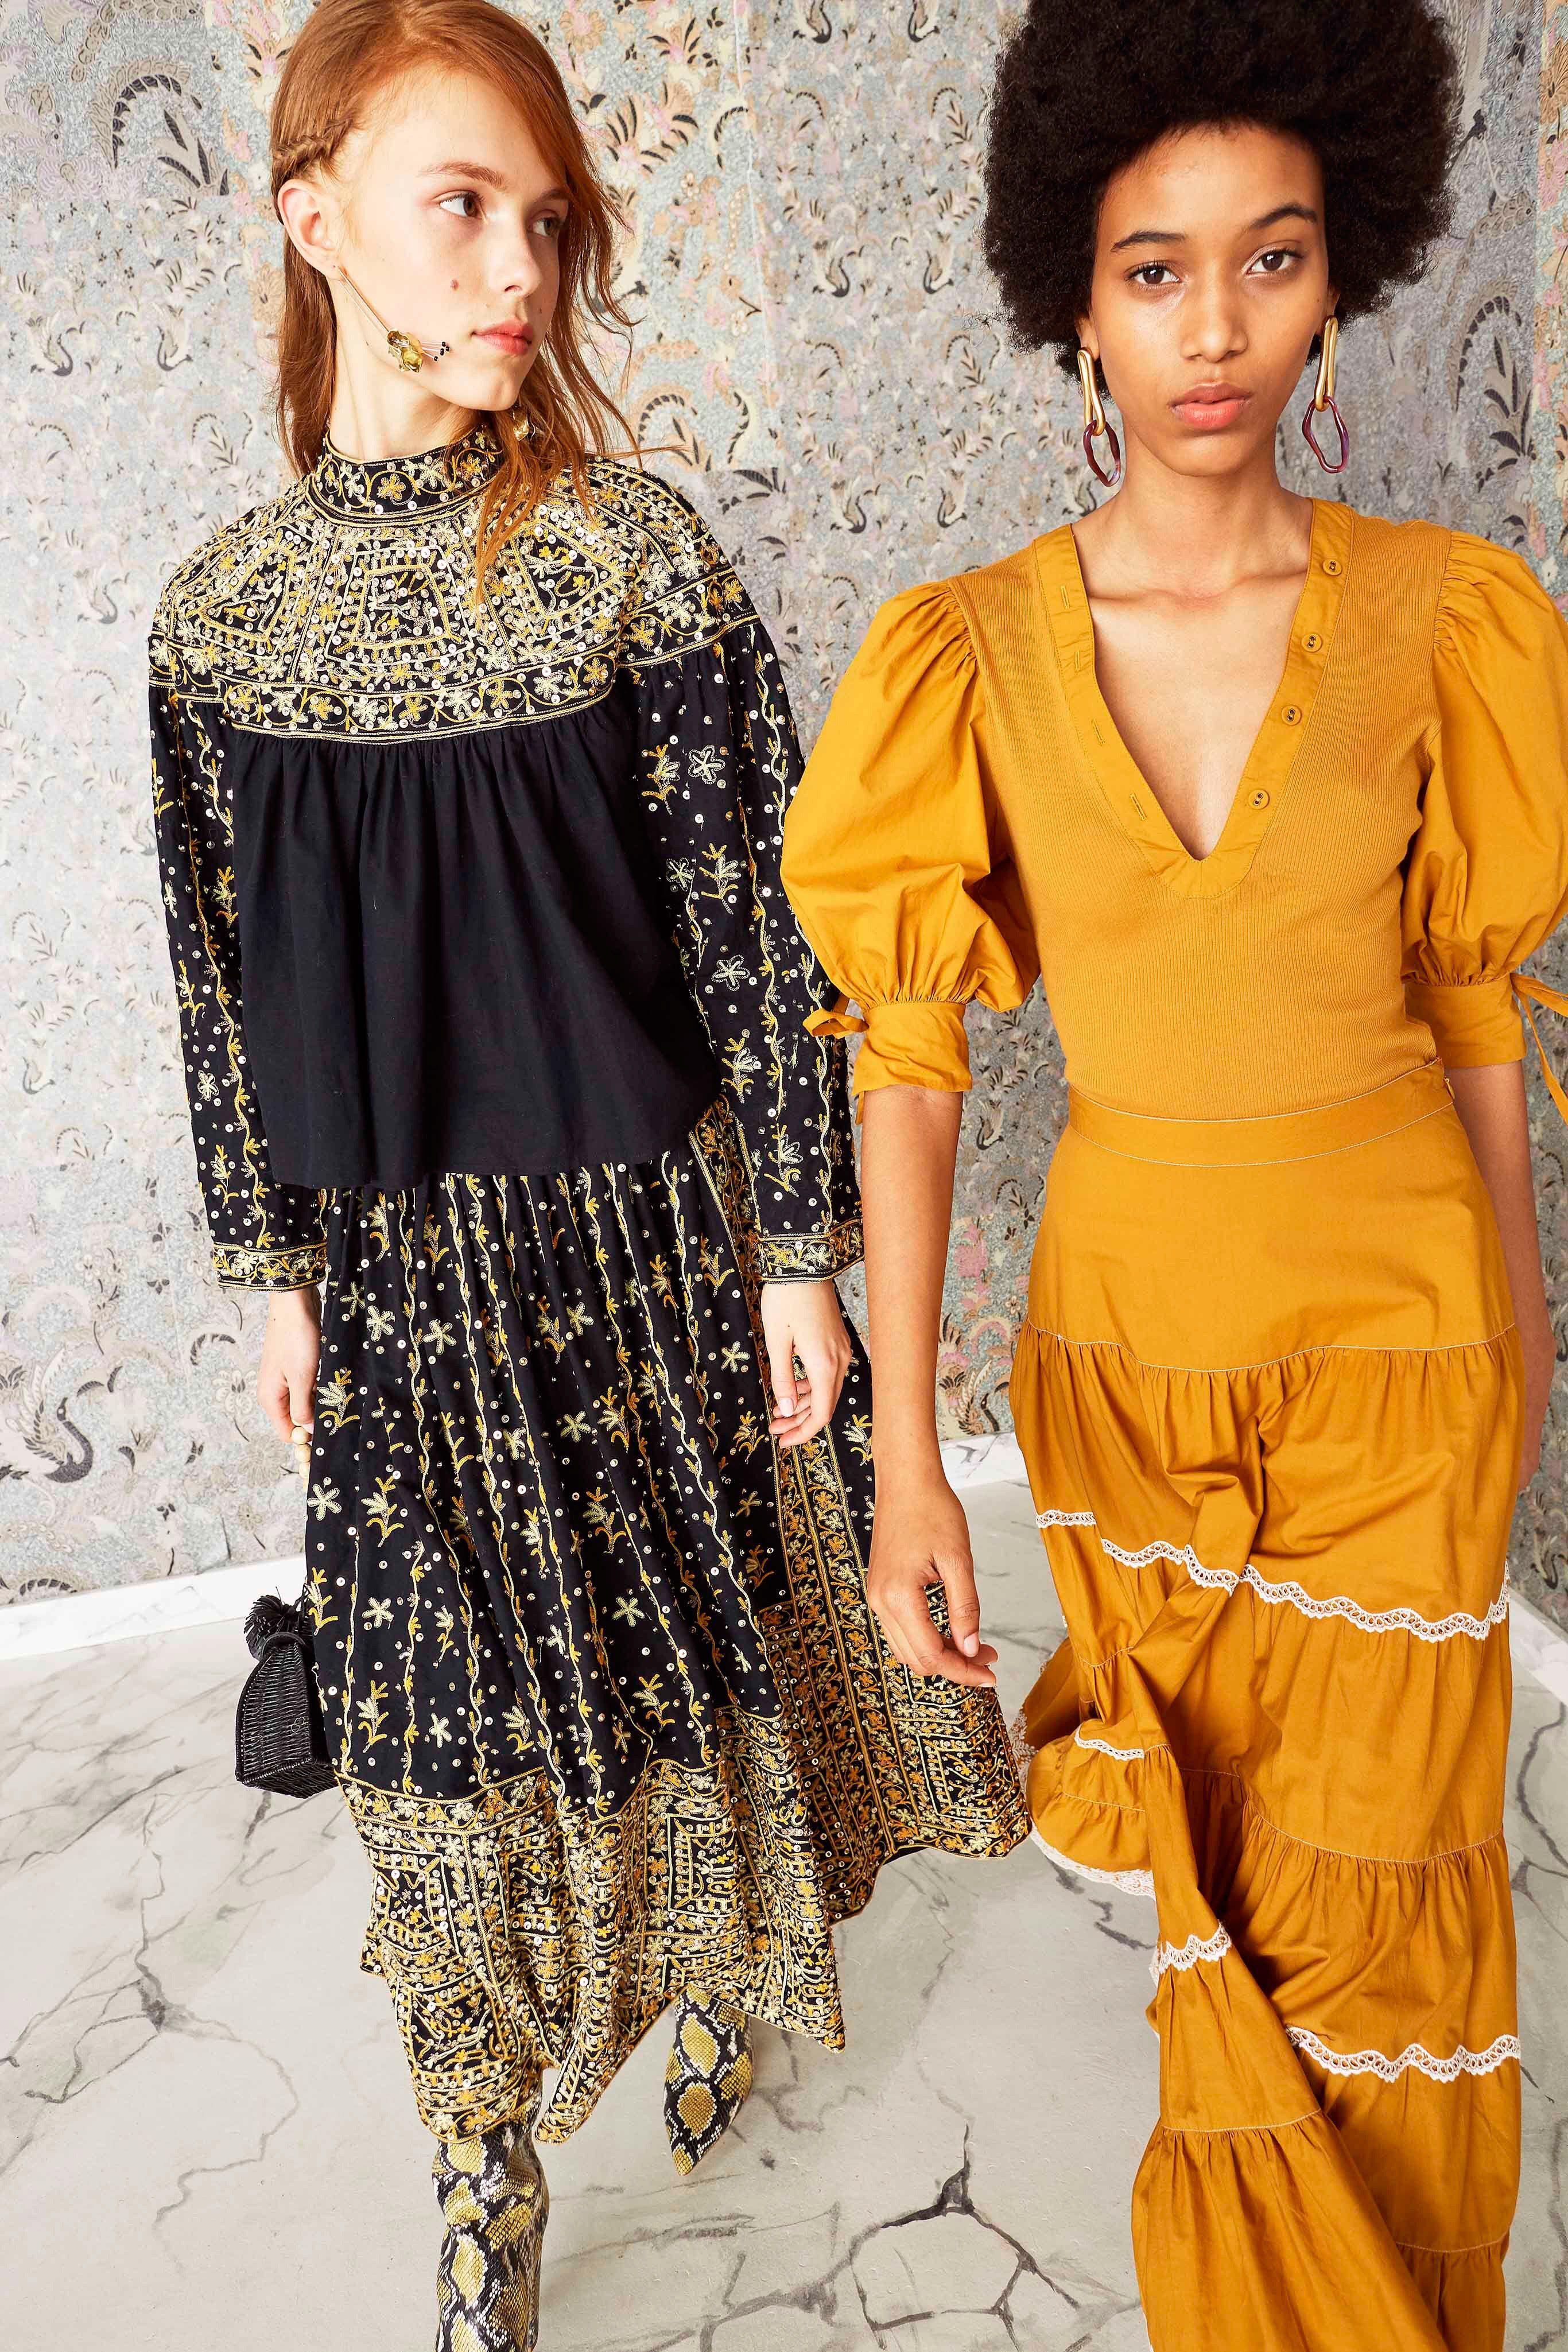 940afbc37b5 Ulla Johnson Pre-Fall 2019 Fashion Show Collection  See the complete Ulla  Johnson Pre-Fall 2019 collection. Look 19